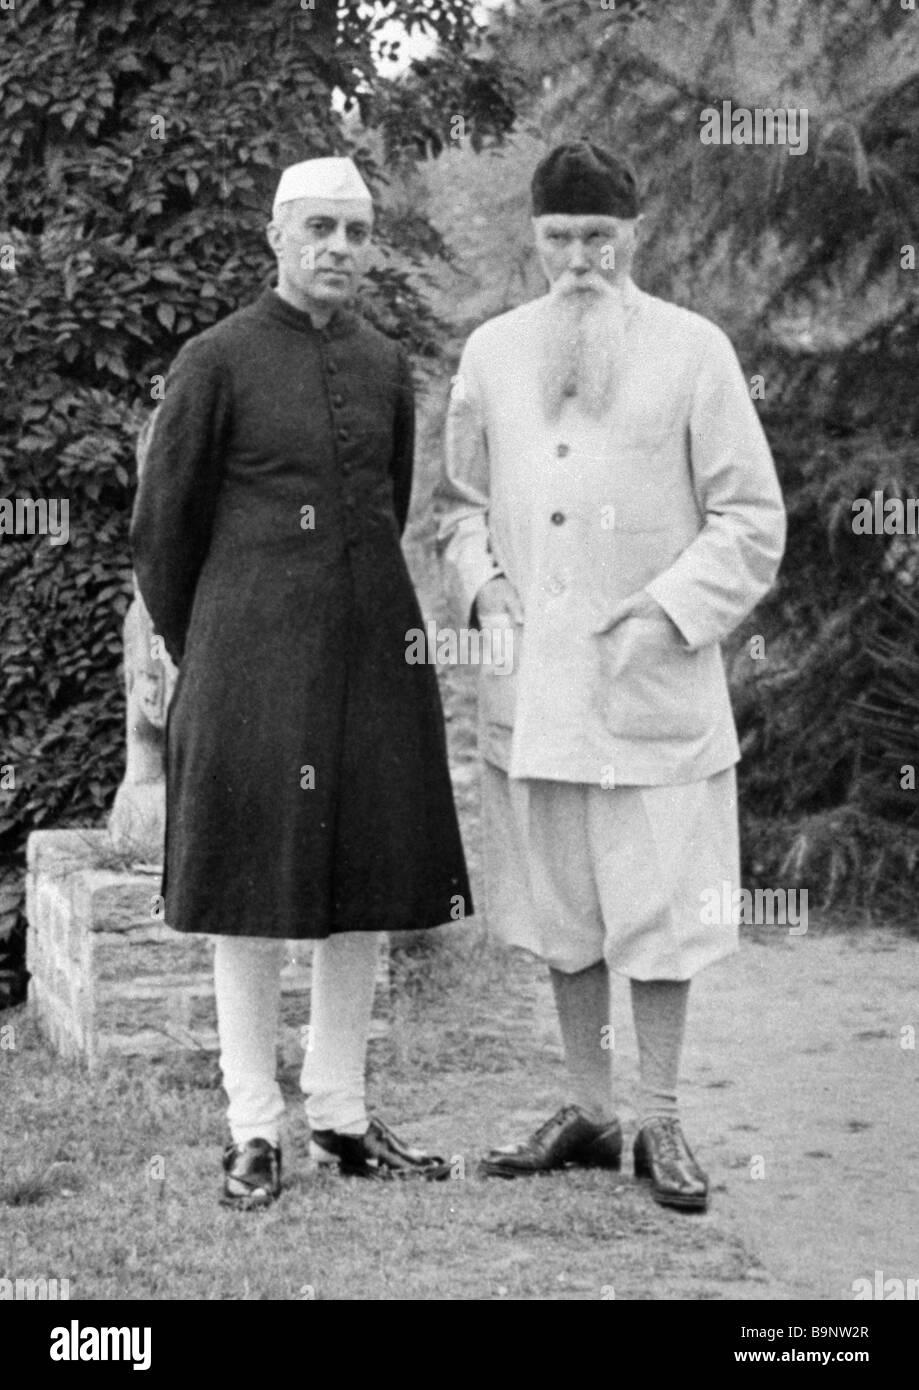 Indian Prime Minister Jawaharlal Nehru left meeting Russian painter Nikolai Roerich in Kulu Valley - Stock Image